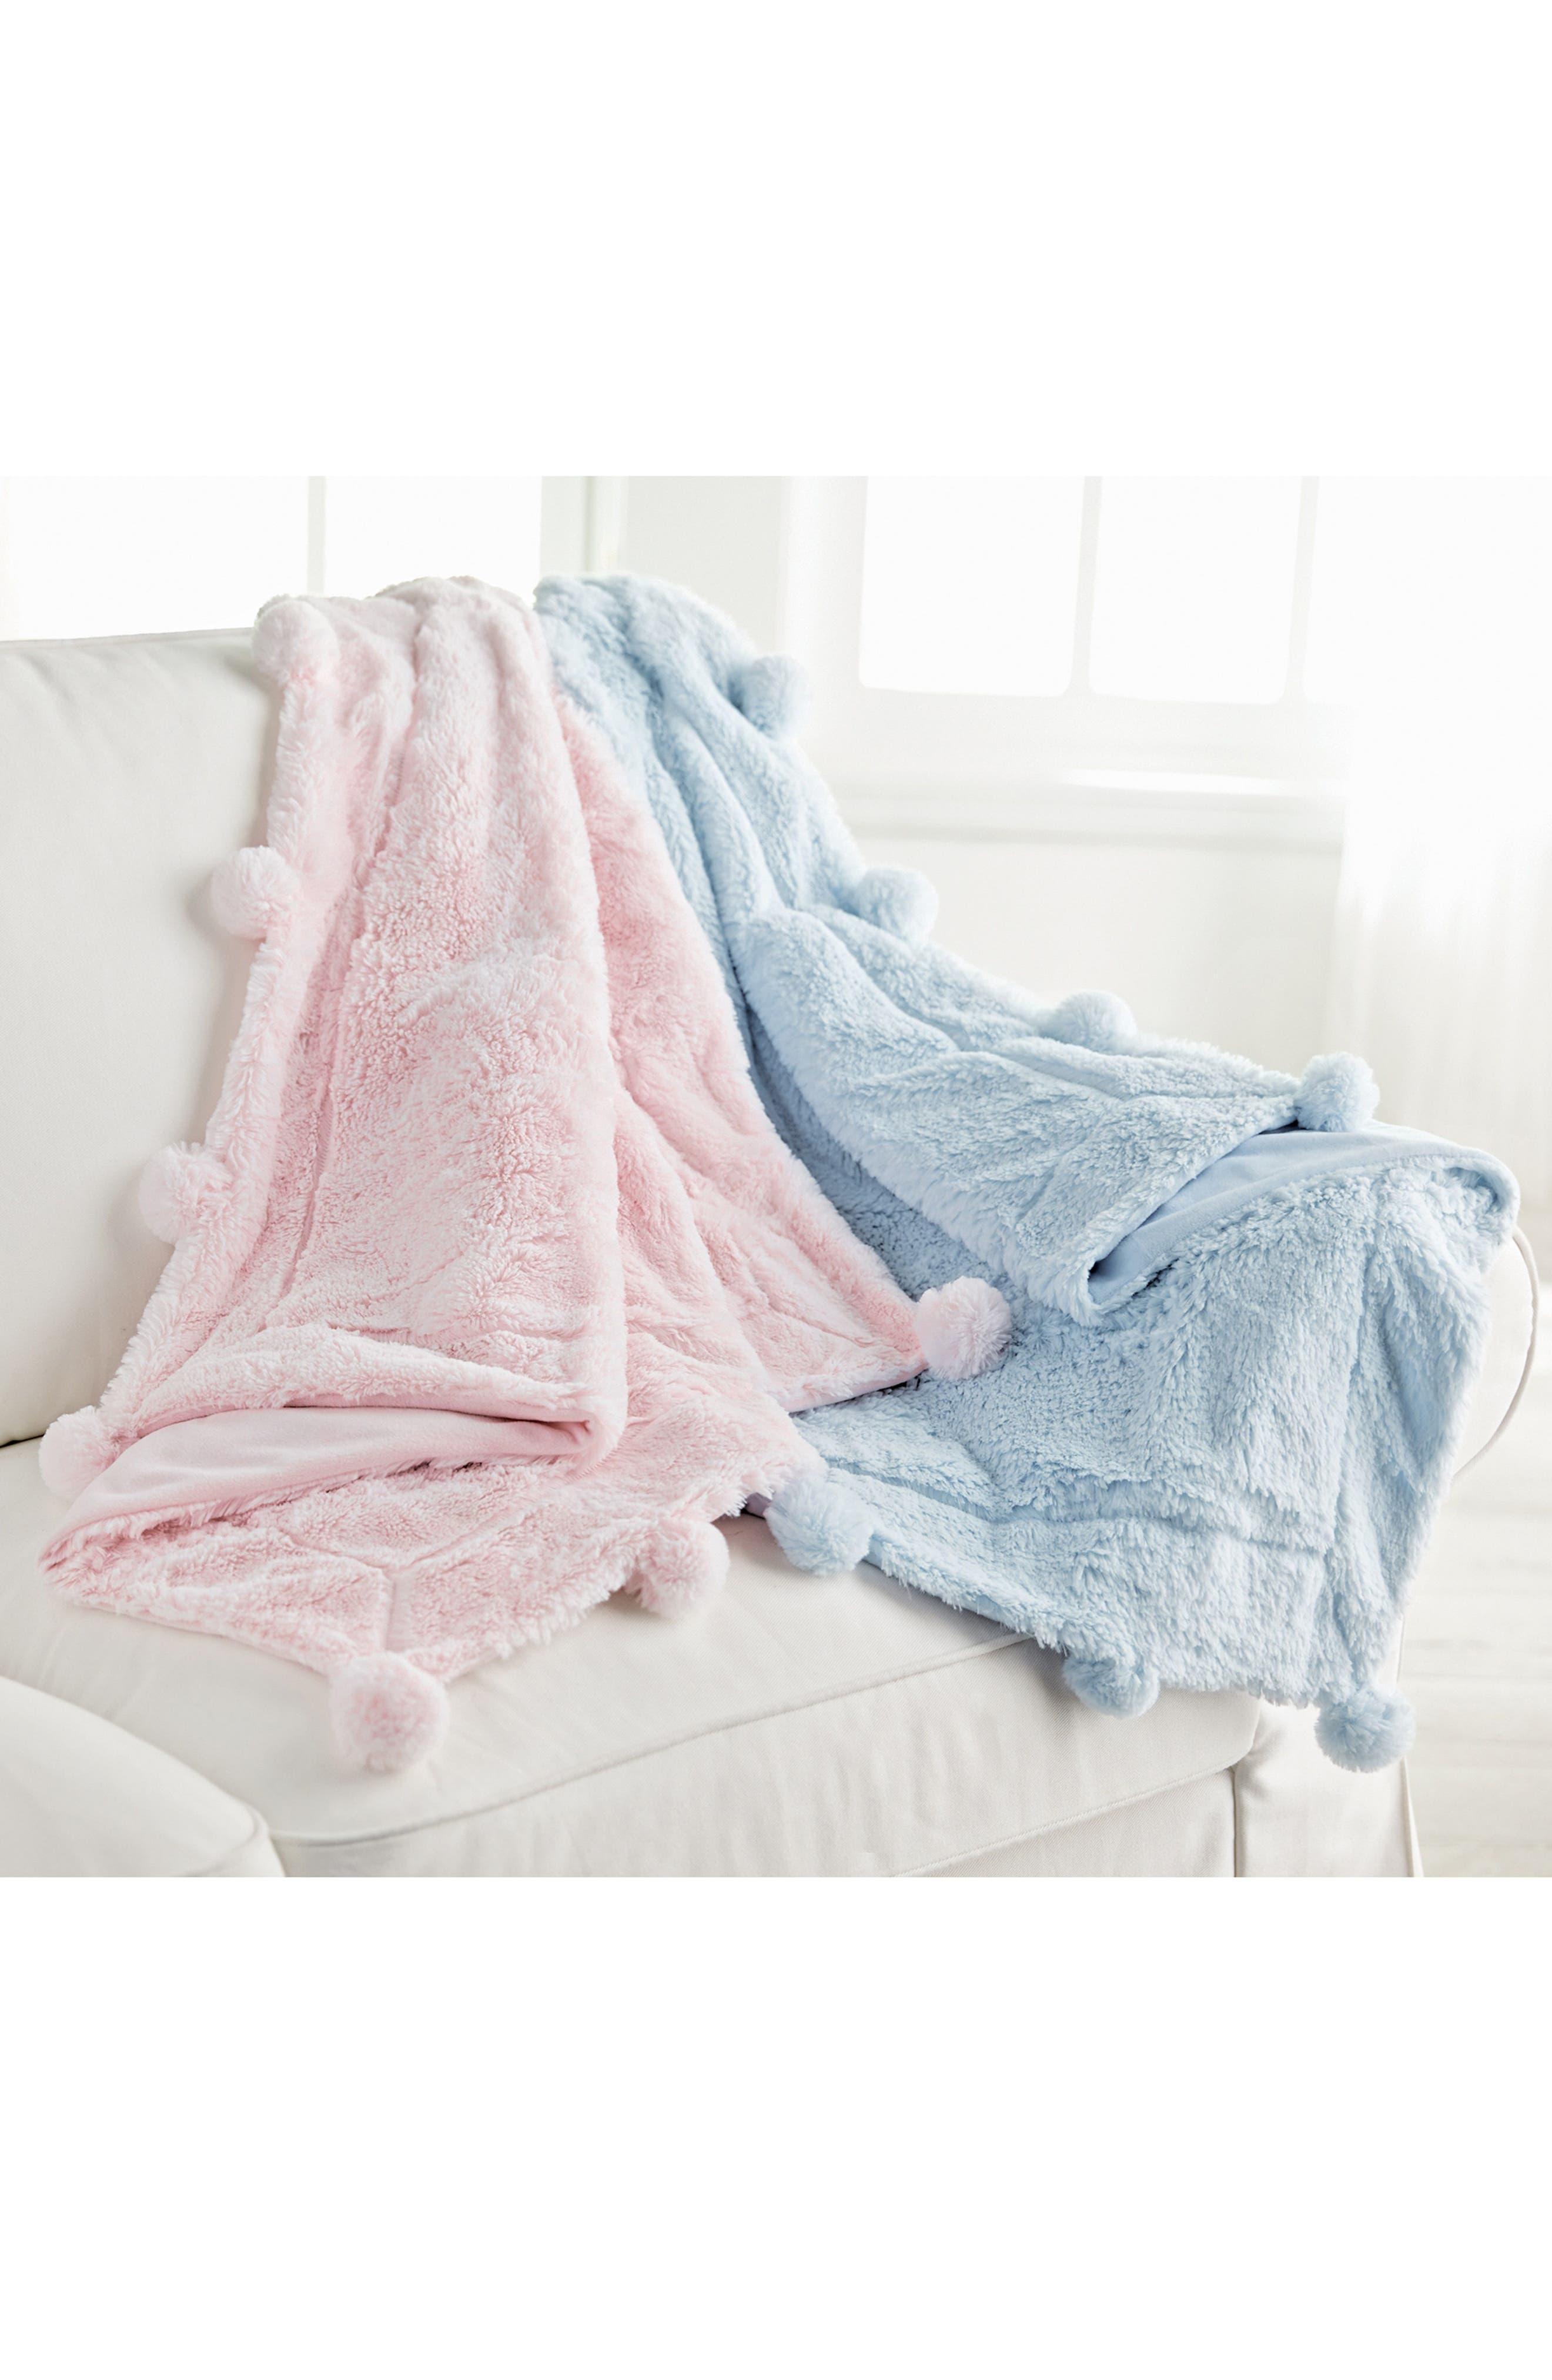 Pompom Receiving Blanket,                             Alternate thumbnail 2, color,                             PINK